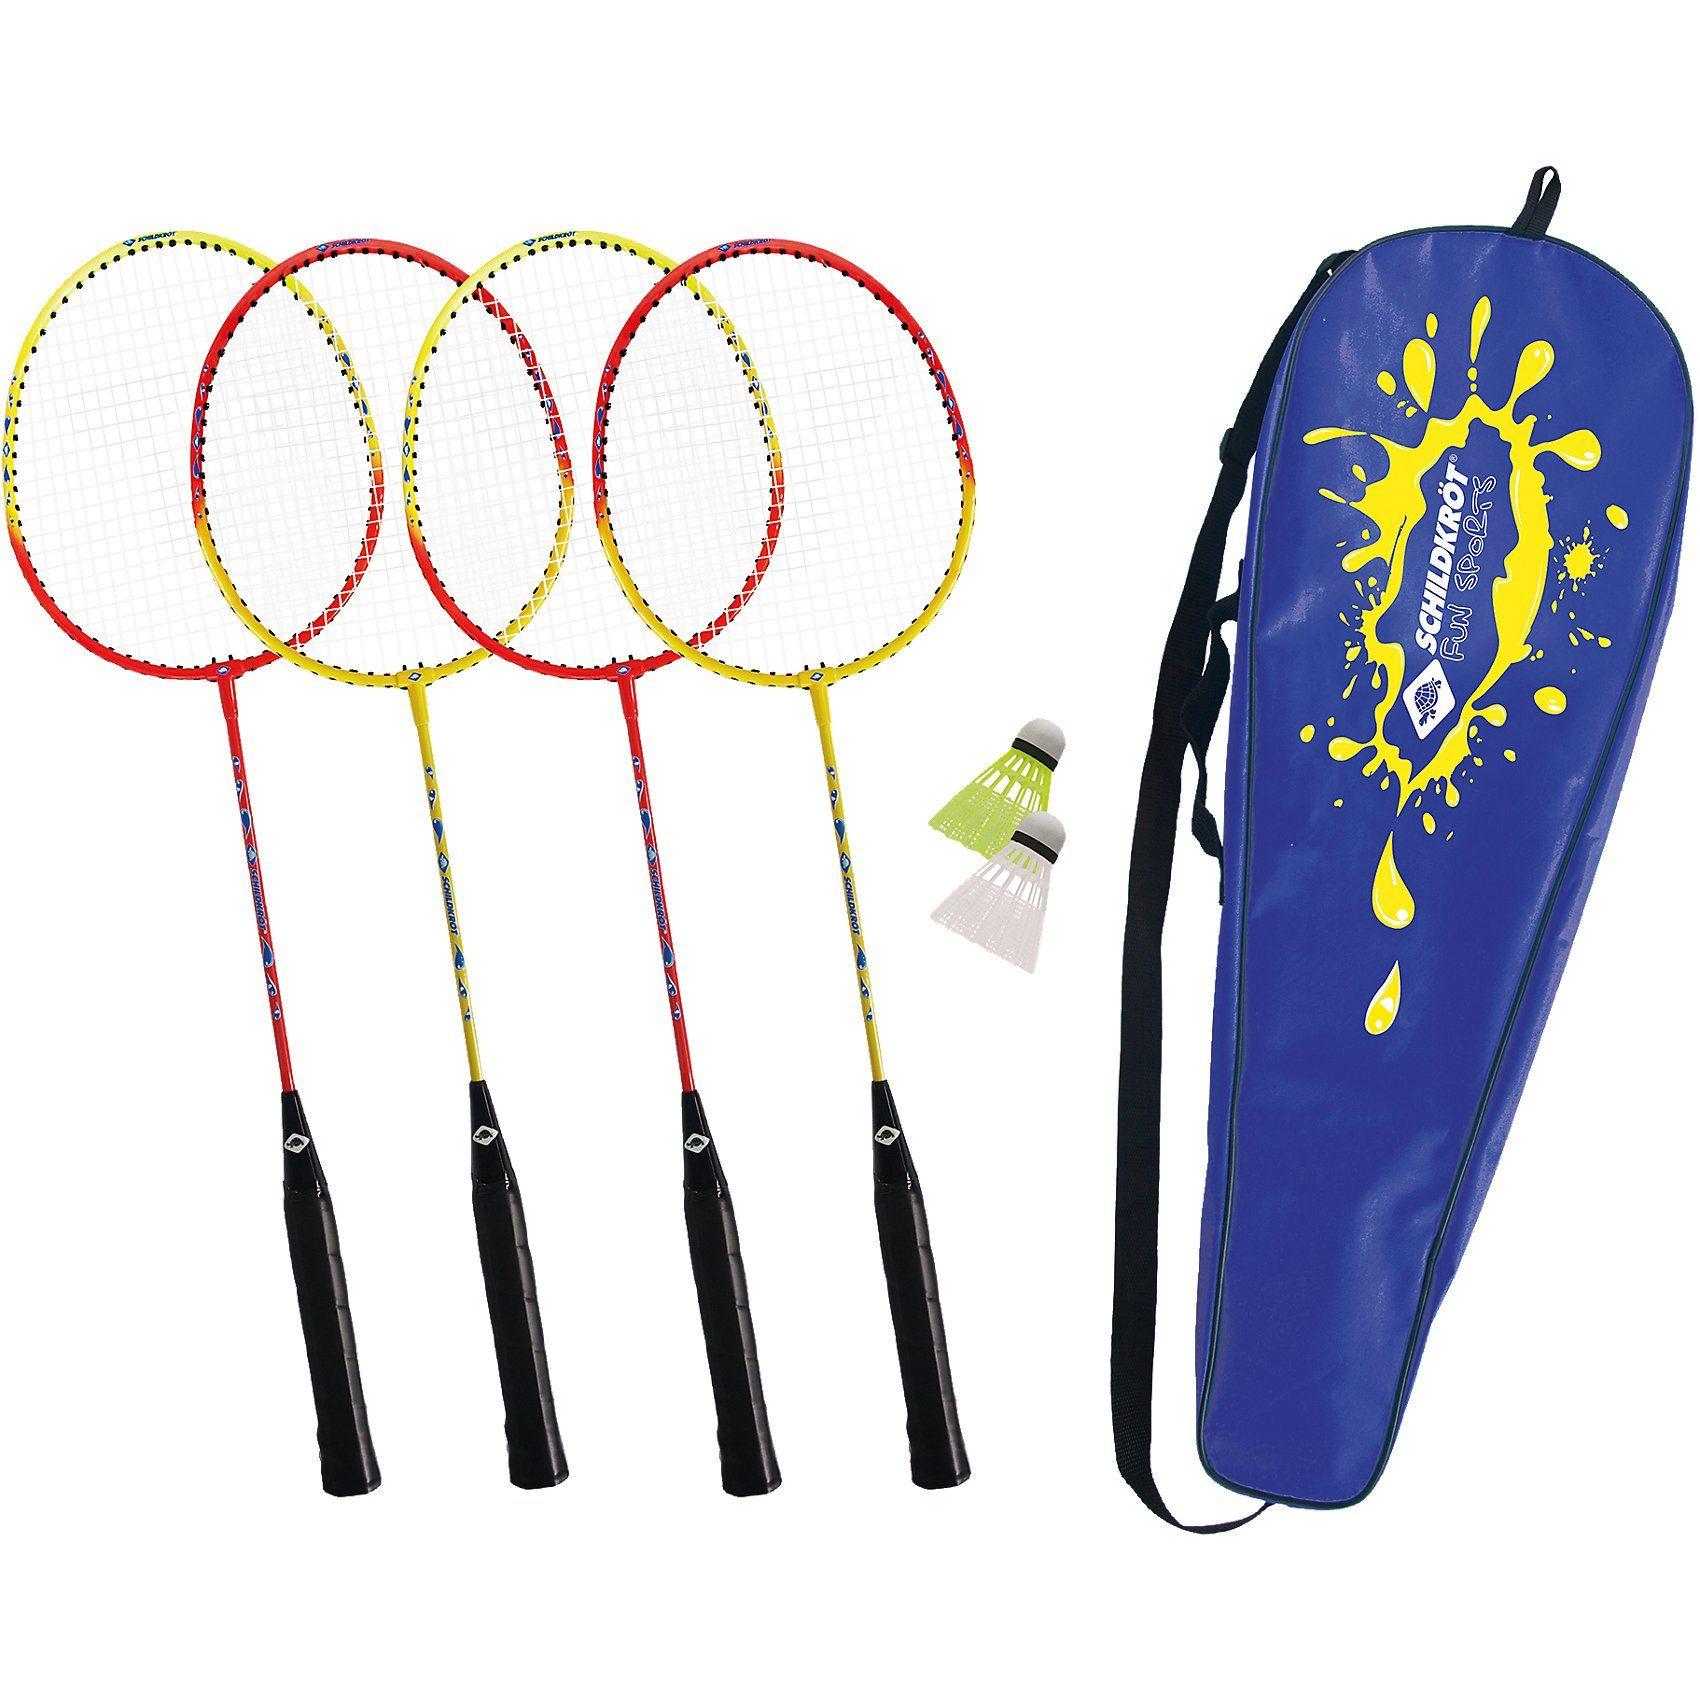 3er Set Sonic Speed Baddminton Bälle Federbälle gelb Sunflex Bälle